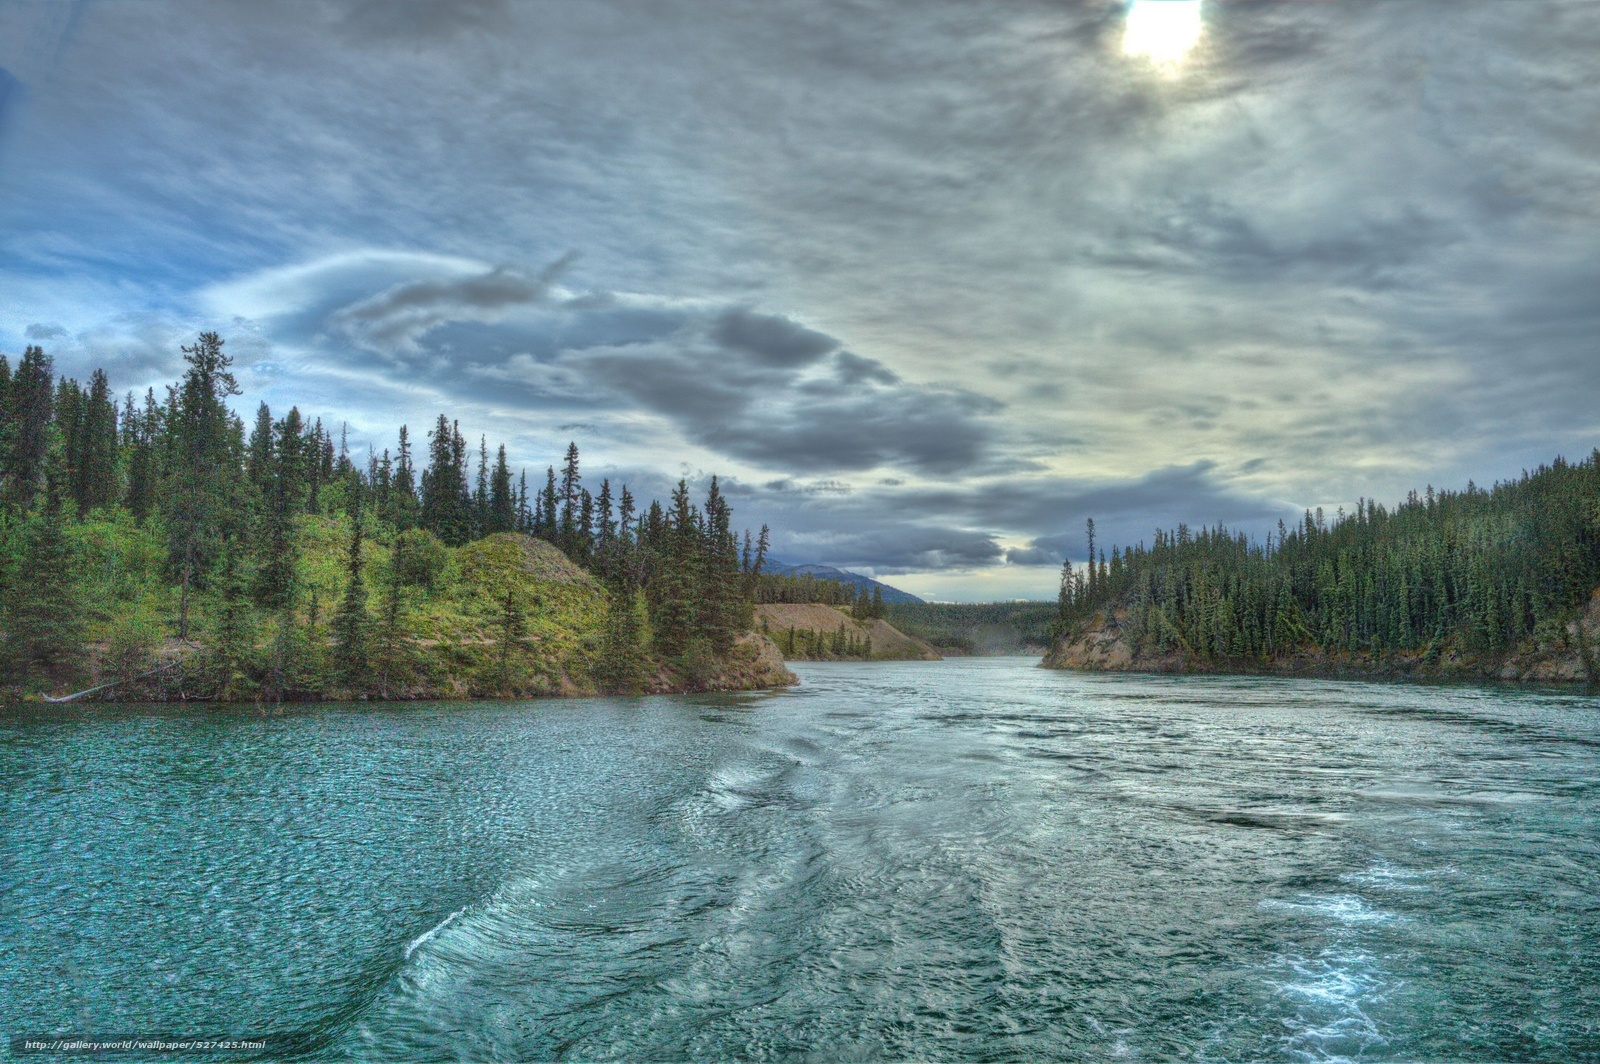 Download wallpaper yukon river canada Yukon River Canada 1600x1064